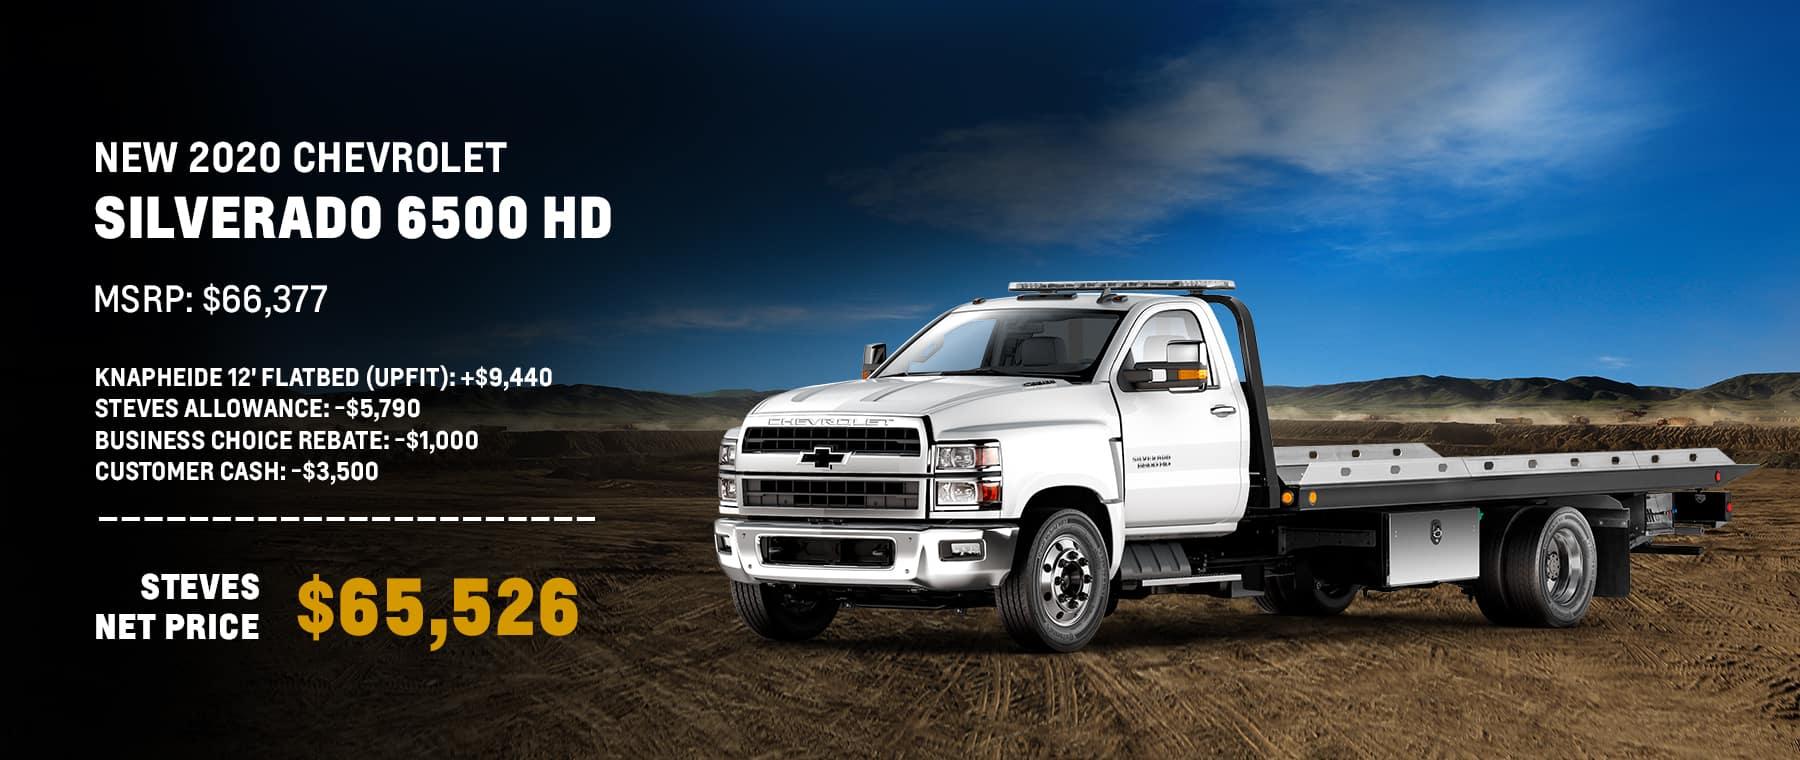 New 2020 Chevrolet Silverado 6500 HD MSRP: $66,377 Knapheide 12' Flatbed (upfit): +$9,440 Steves Allowance: -$5,790 Business Choice Rebate: -$1,000 Customer Cash: -$3,500 Steves Net Price: $65,526